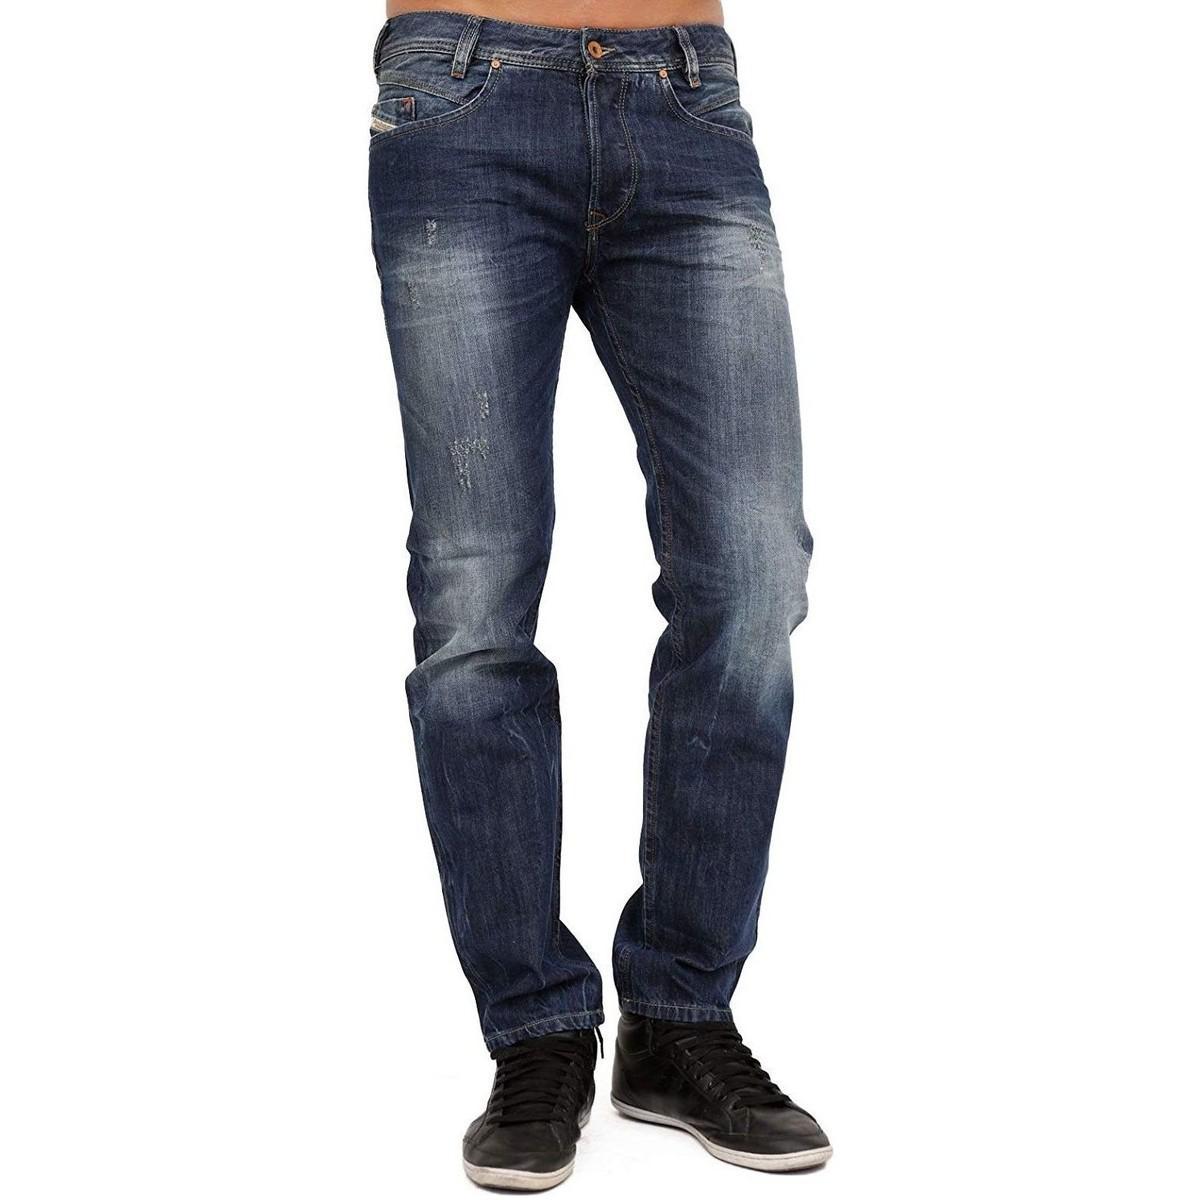 a71ccee9 DIESEL - Men's Jeans Iakop 8b9 - Regular Slim - Tapered Men's In ...